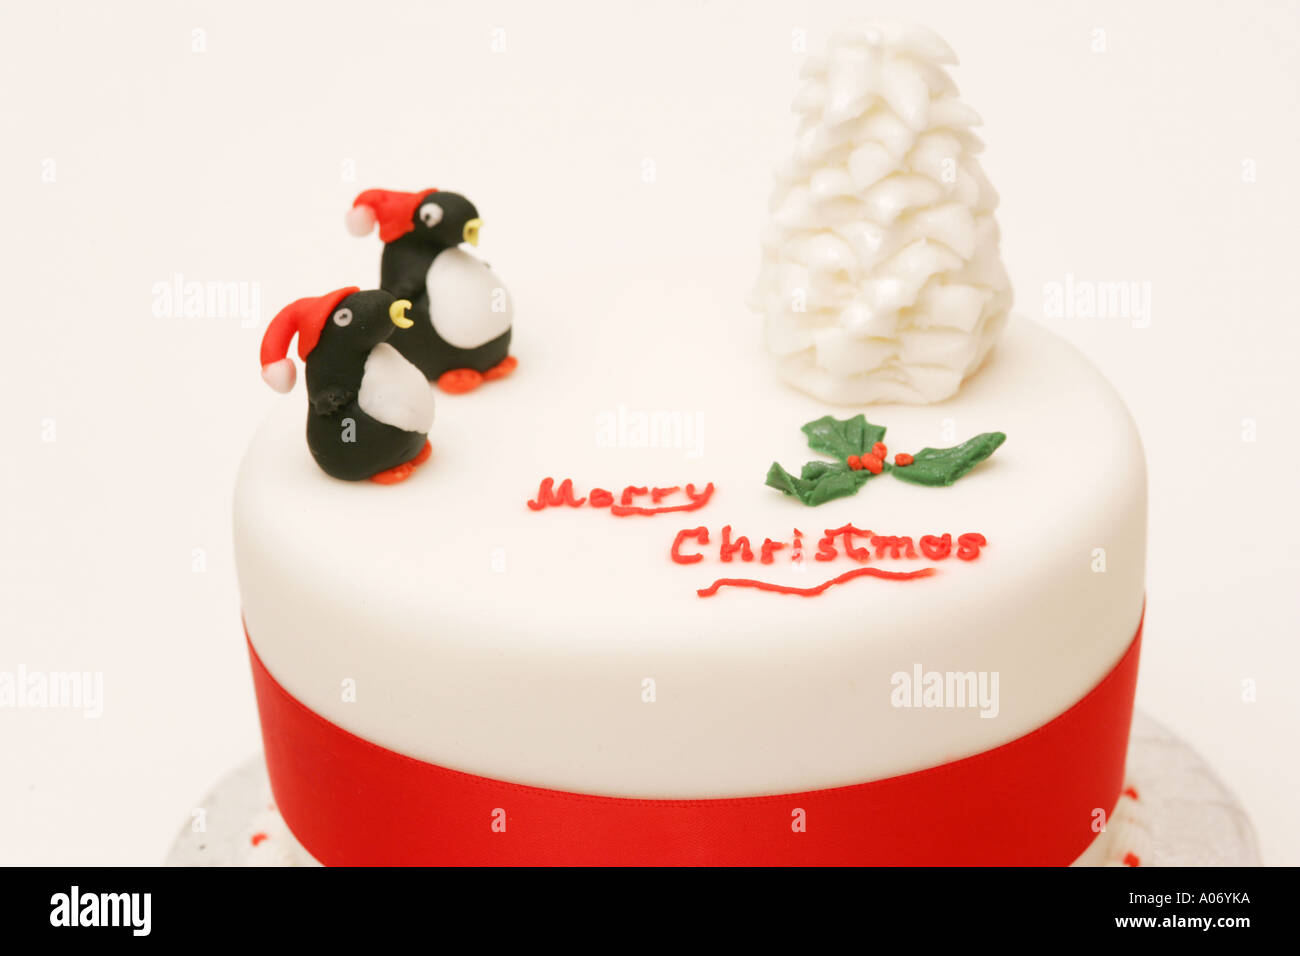 closeup traditional seasonal festive british xmas cake with novelty iced tree and penguin decorations merry christmas - British Christmas Cake Decorations